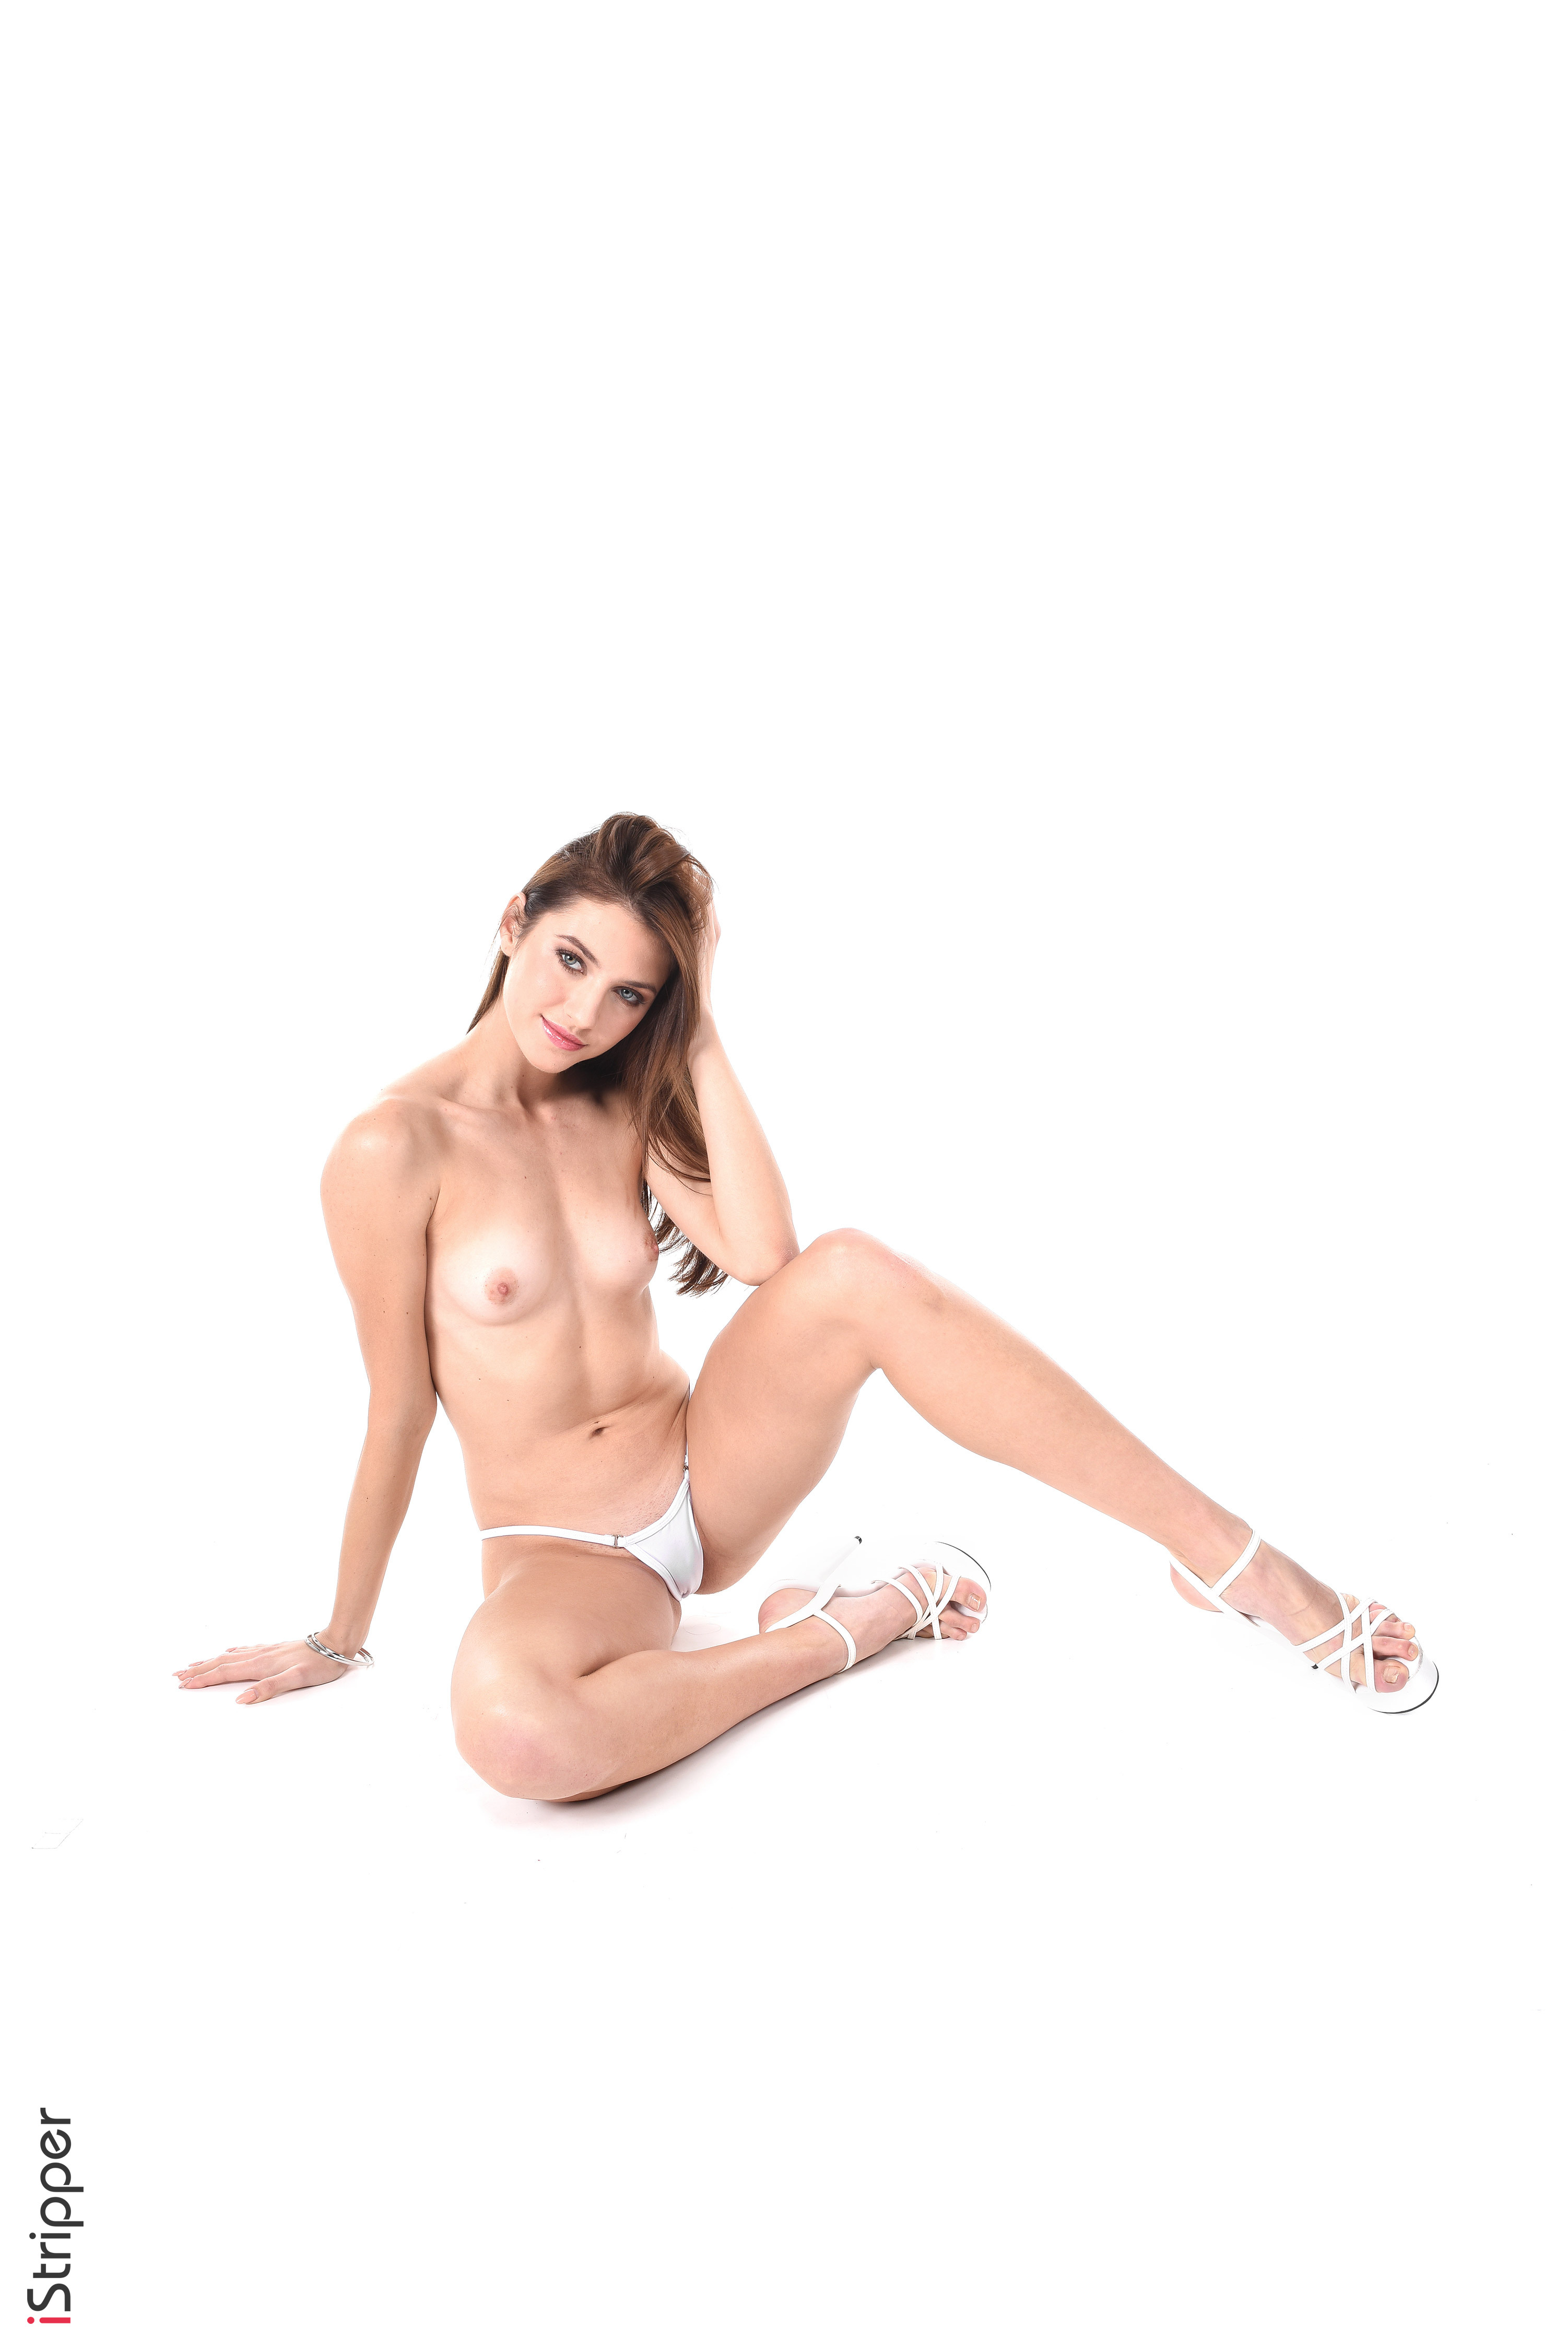 hot Porn star wallpaper